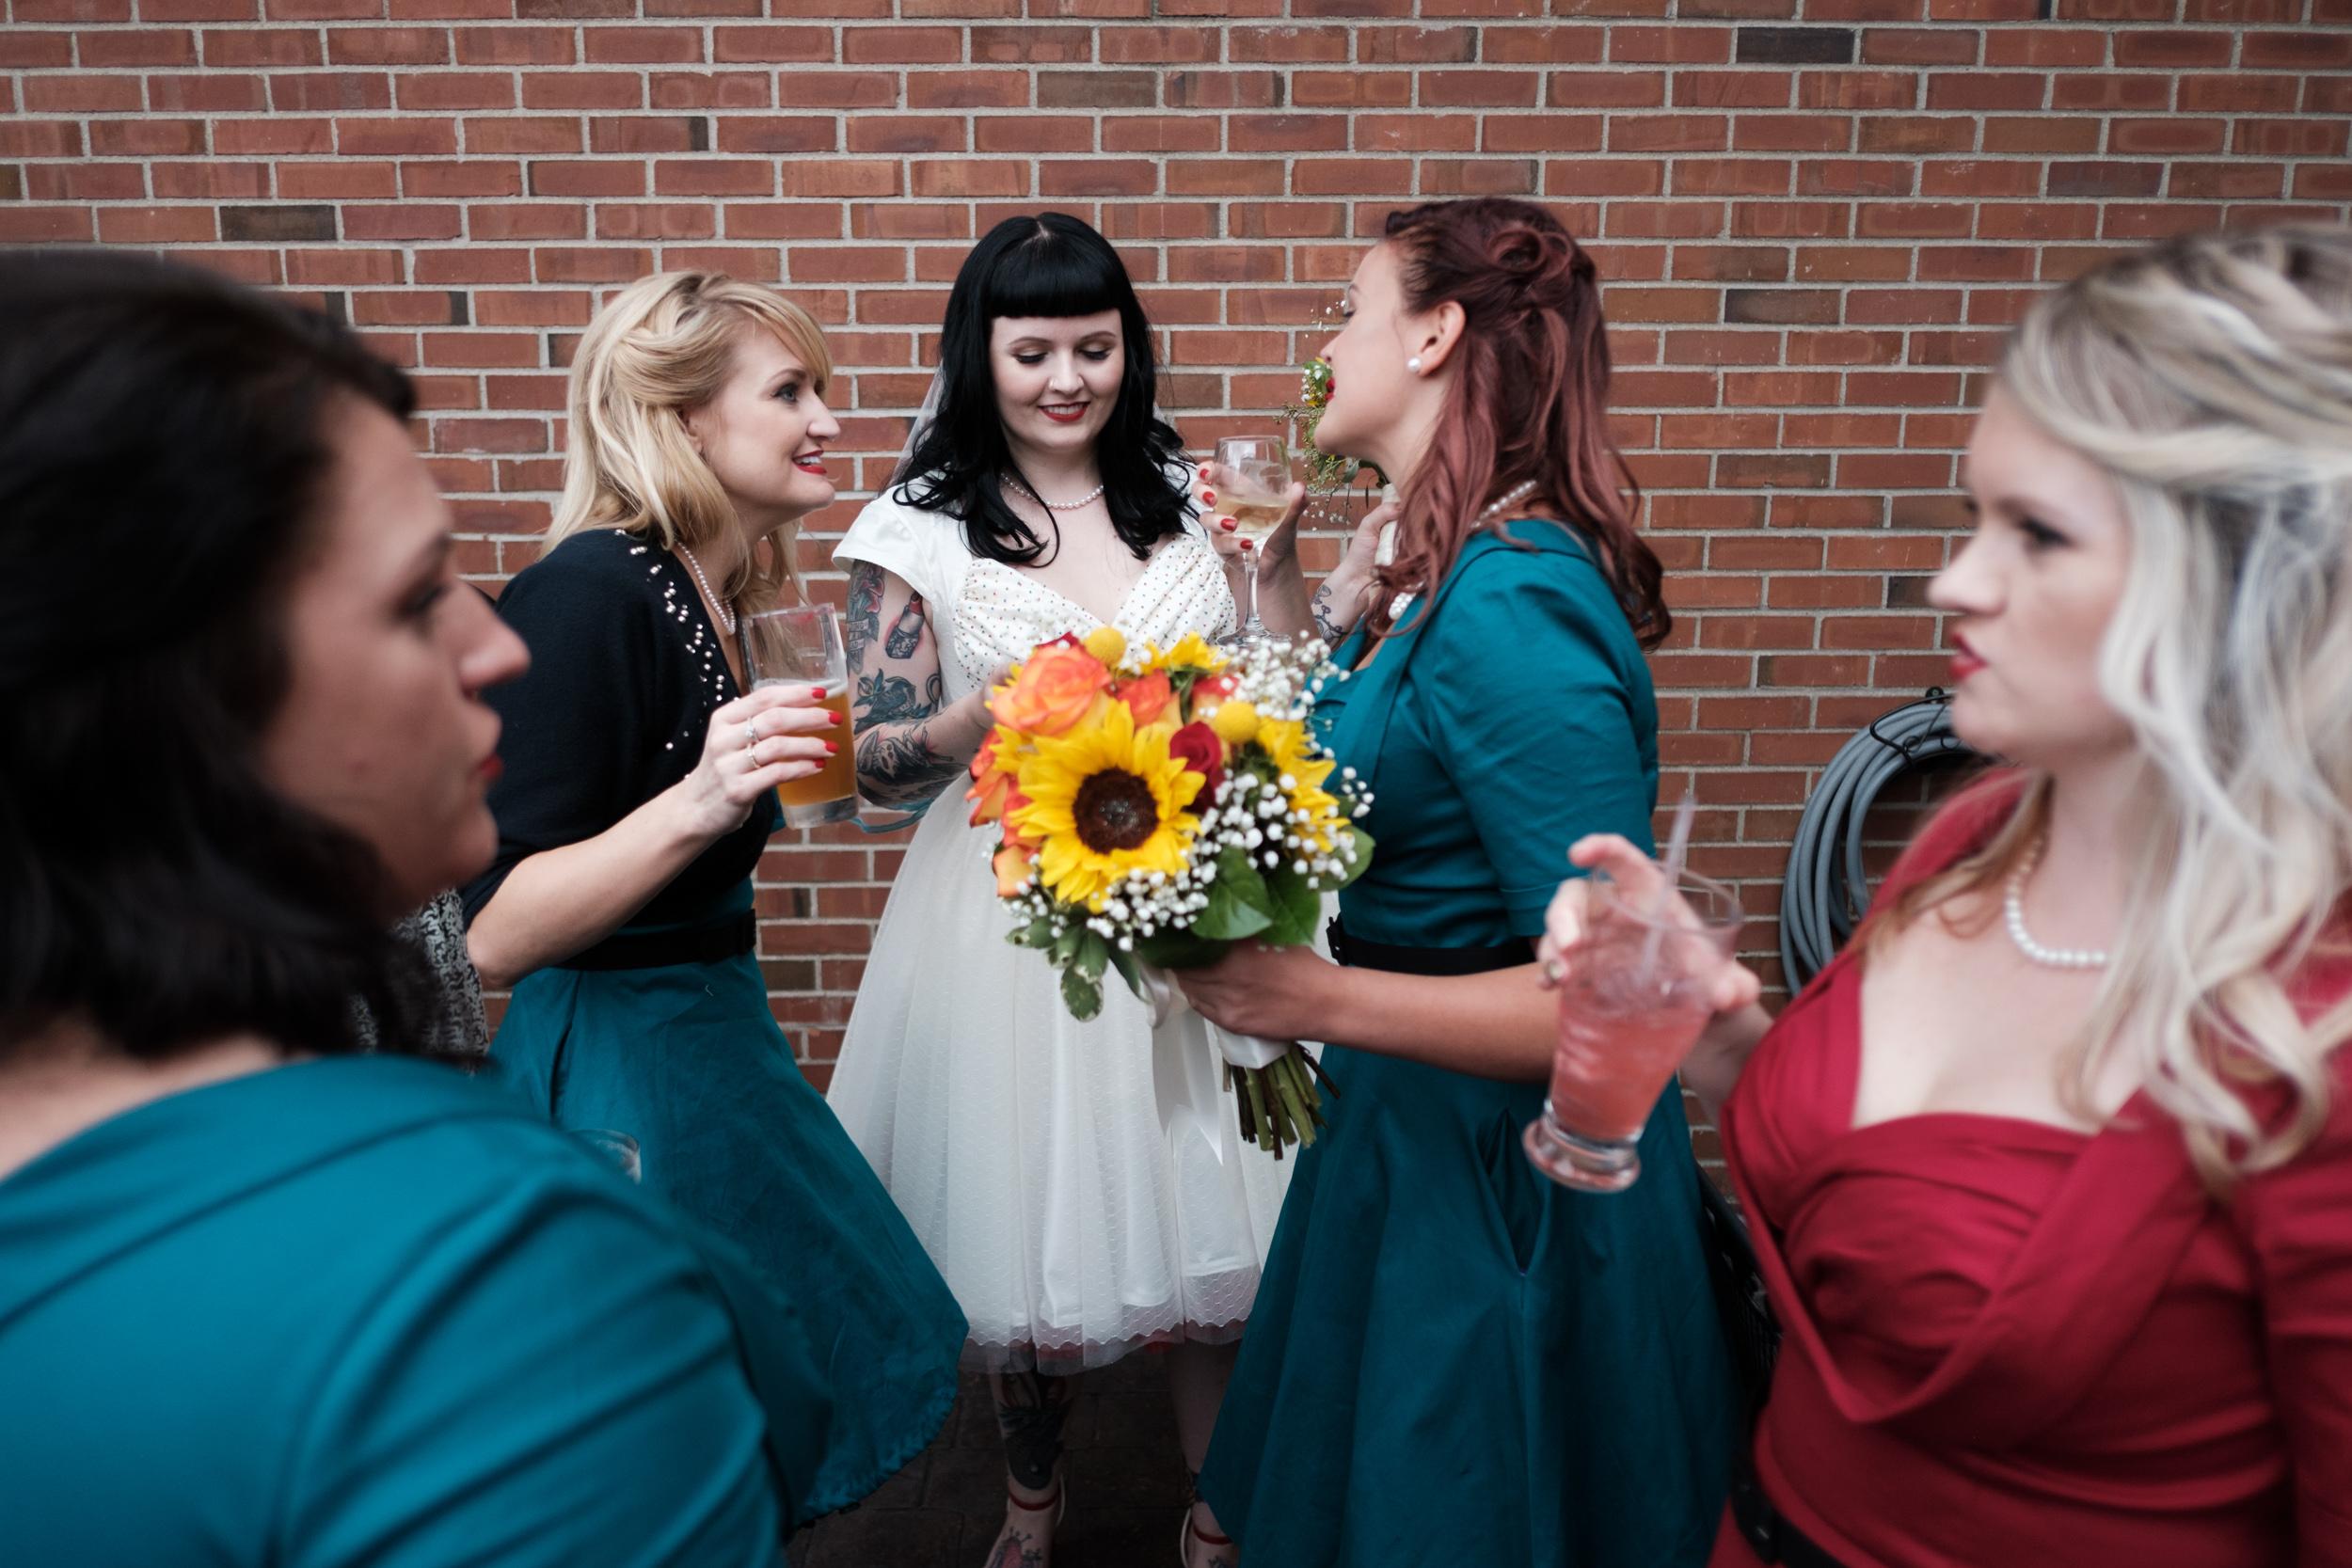 Christian & Sarah wedding photography by Brian milo-203.jpg